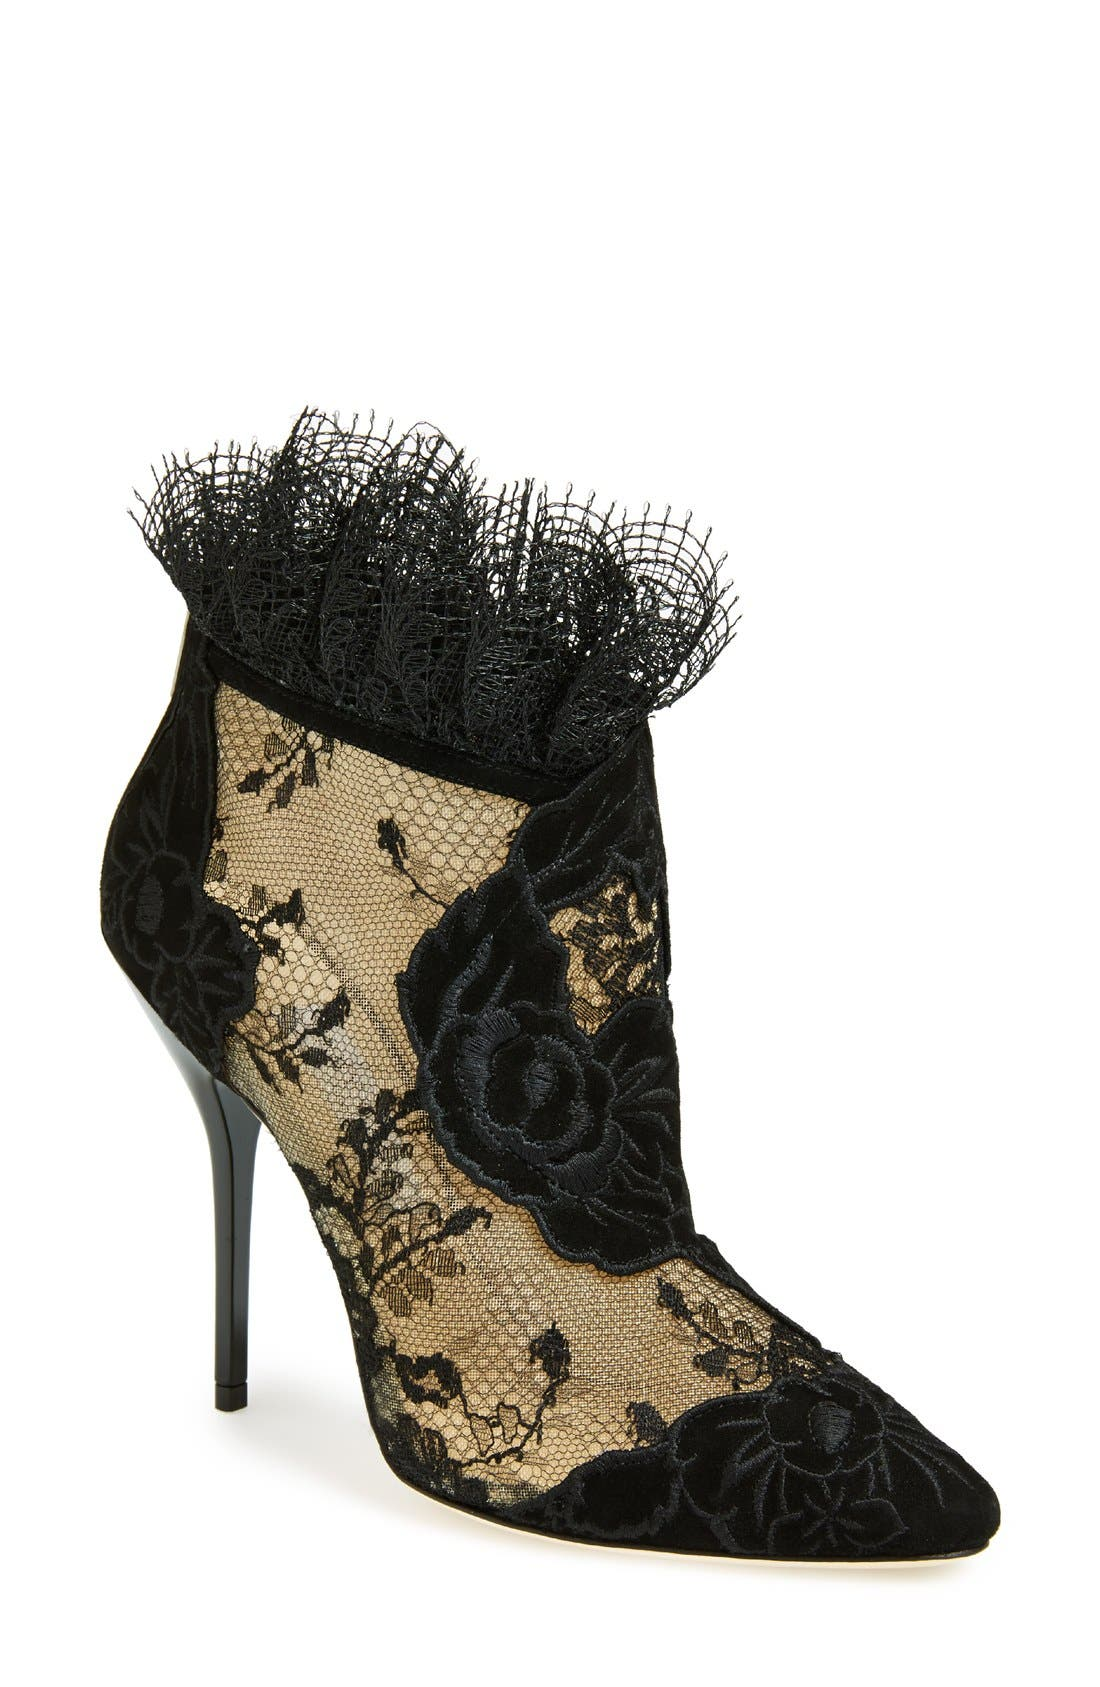 Main Image - Jimmy Choo 'Kamaris' Lace Ankle Bootie (Women)